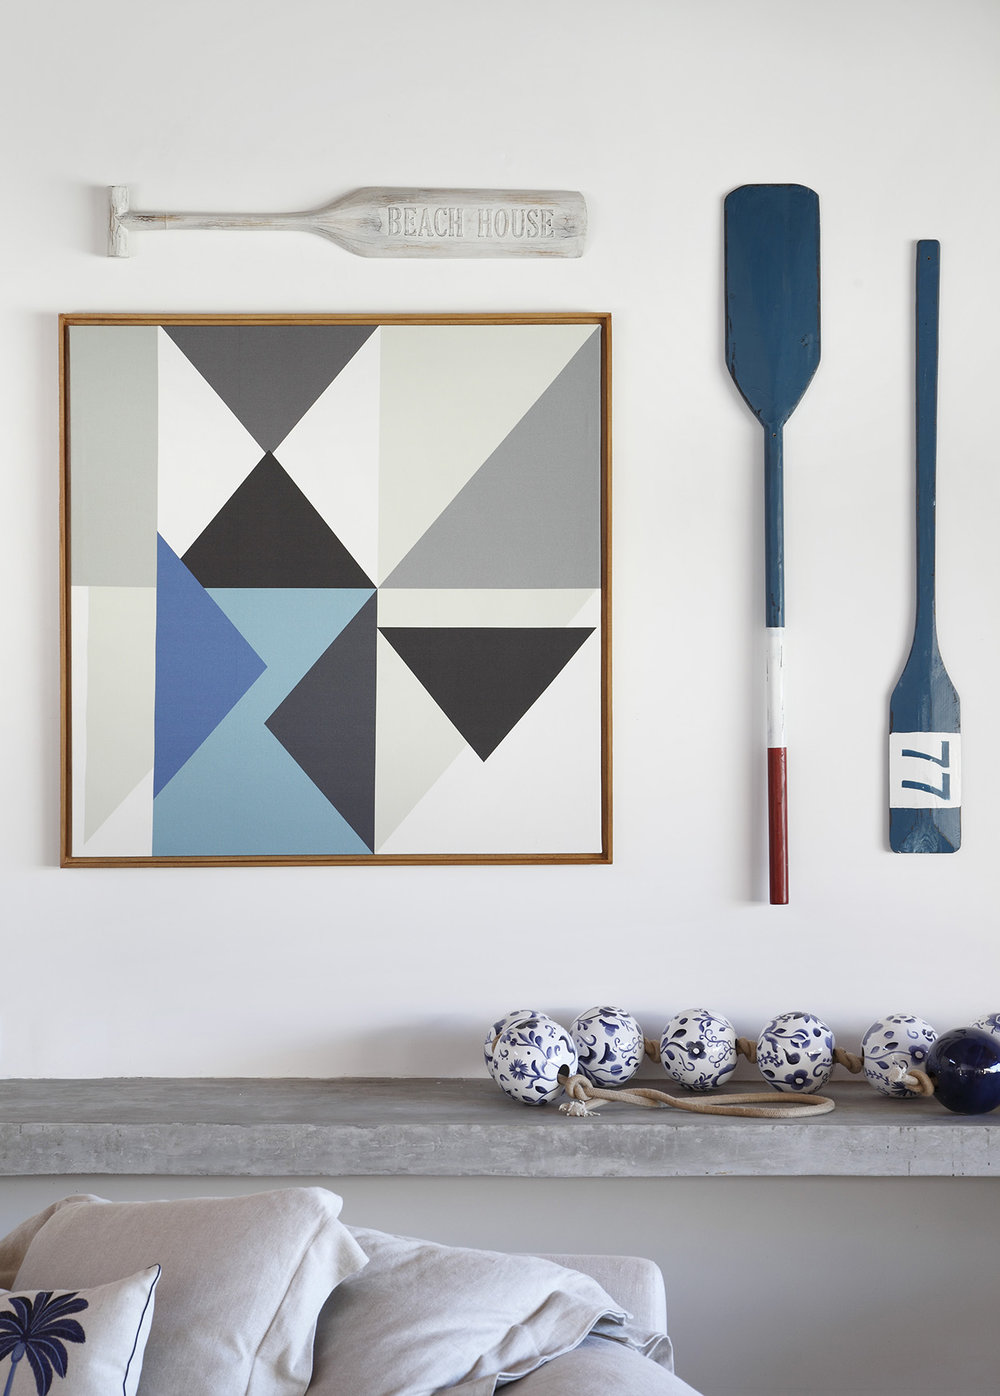 Arrows - paleta azul 1,0 x 1,0m PROJETO RBP ARQUITETURA   FOTO MCa ESTUDIO